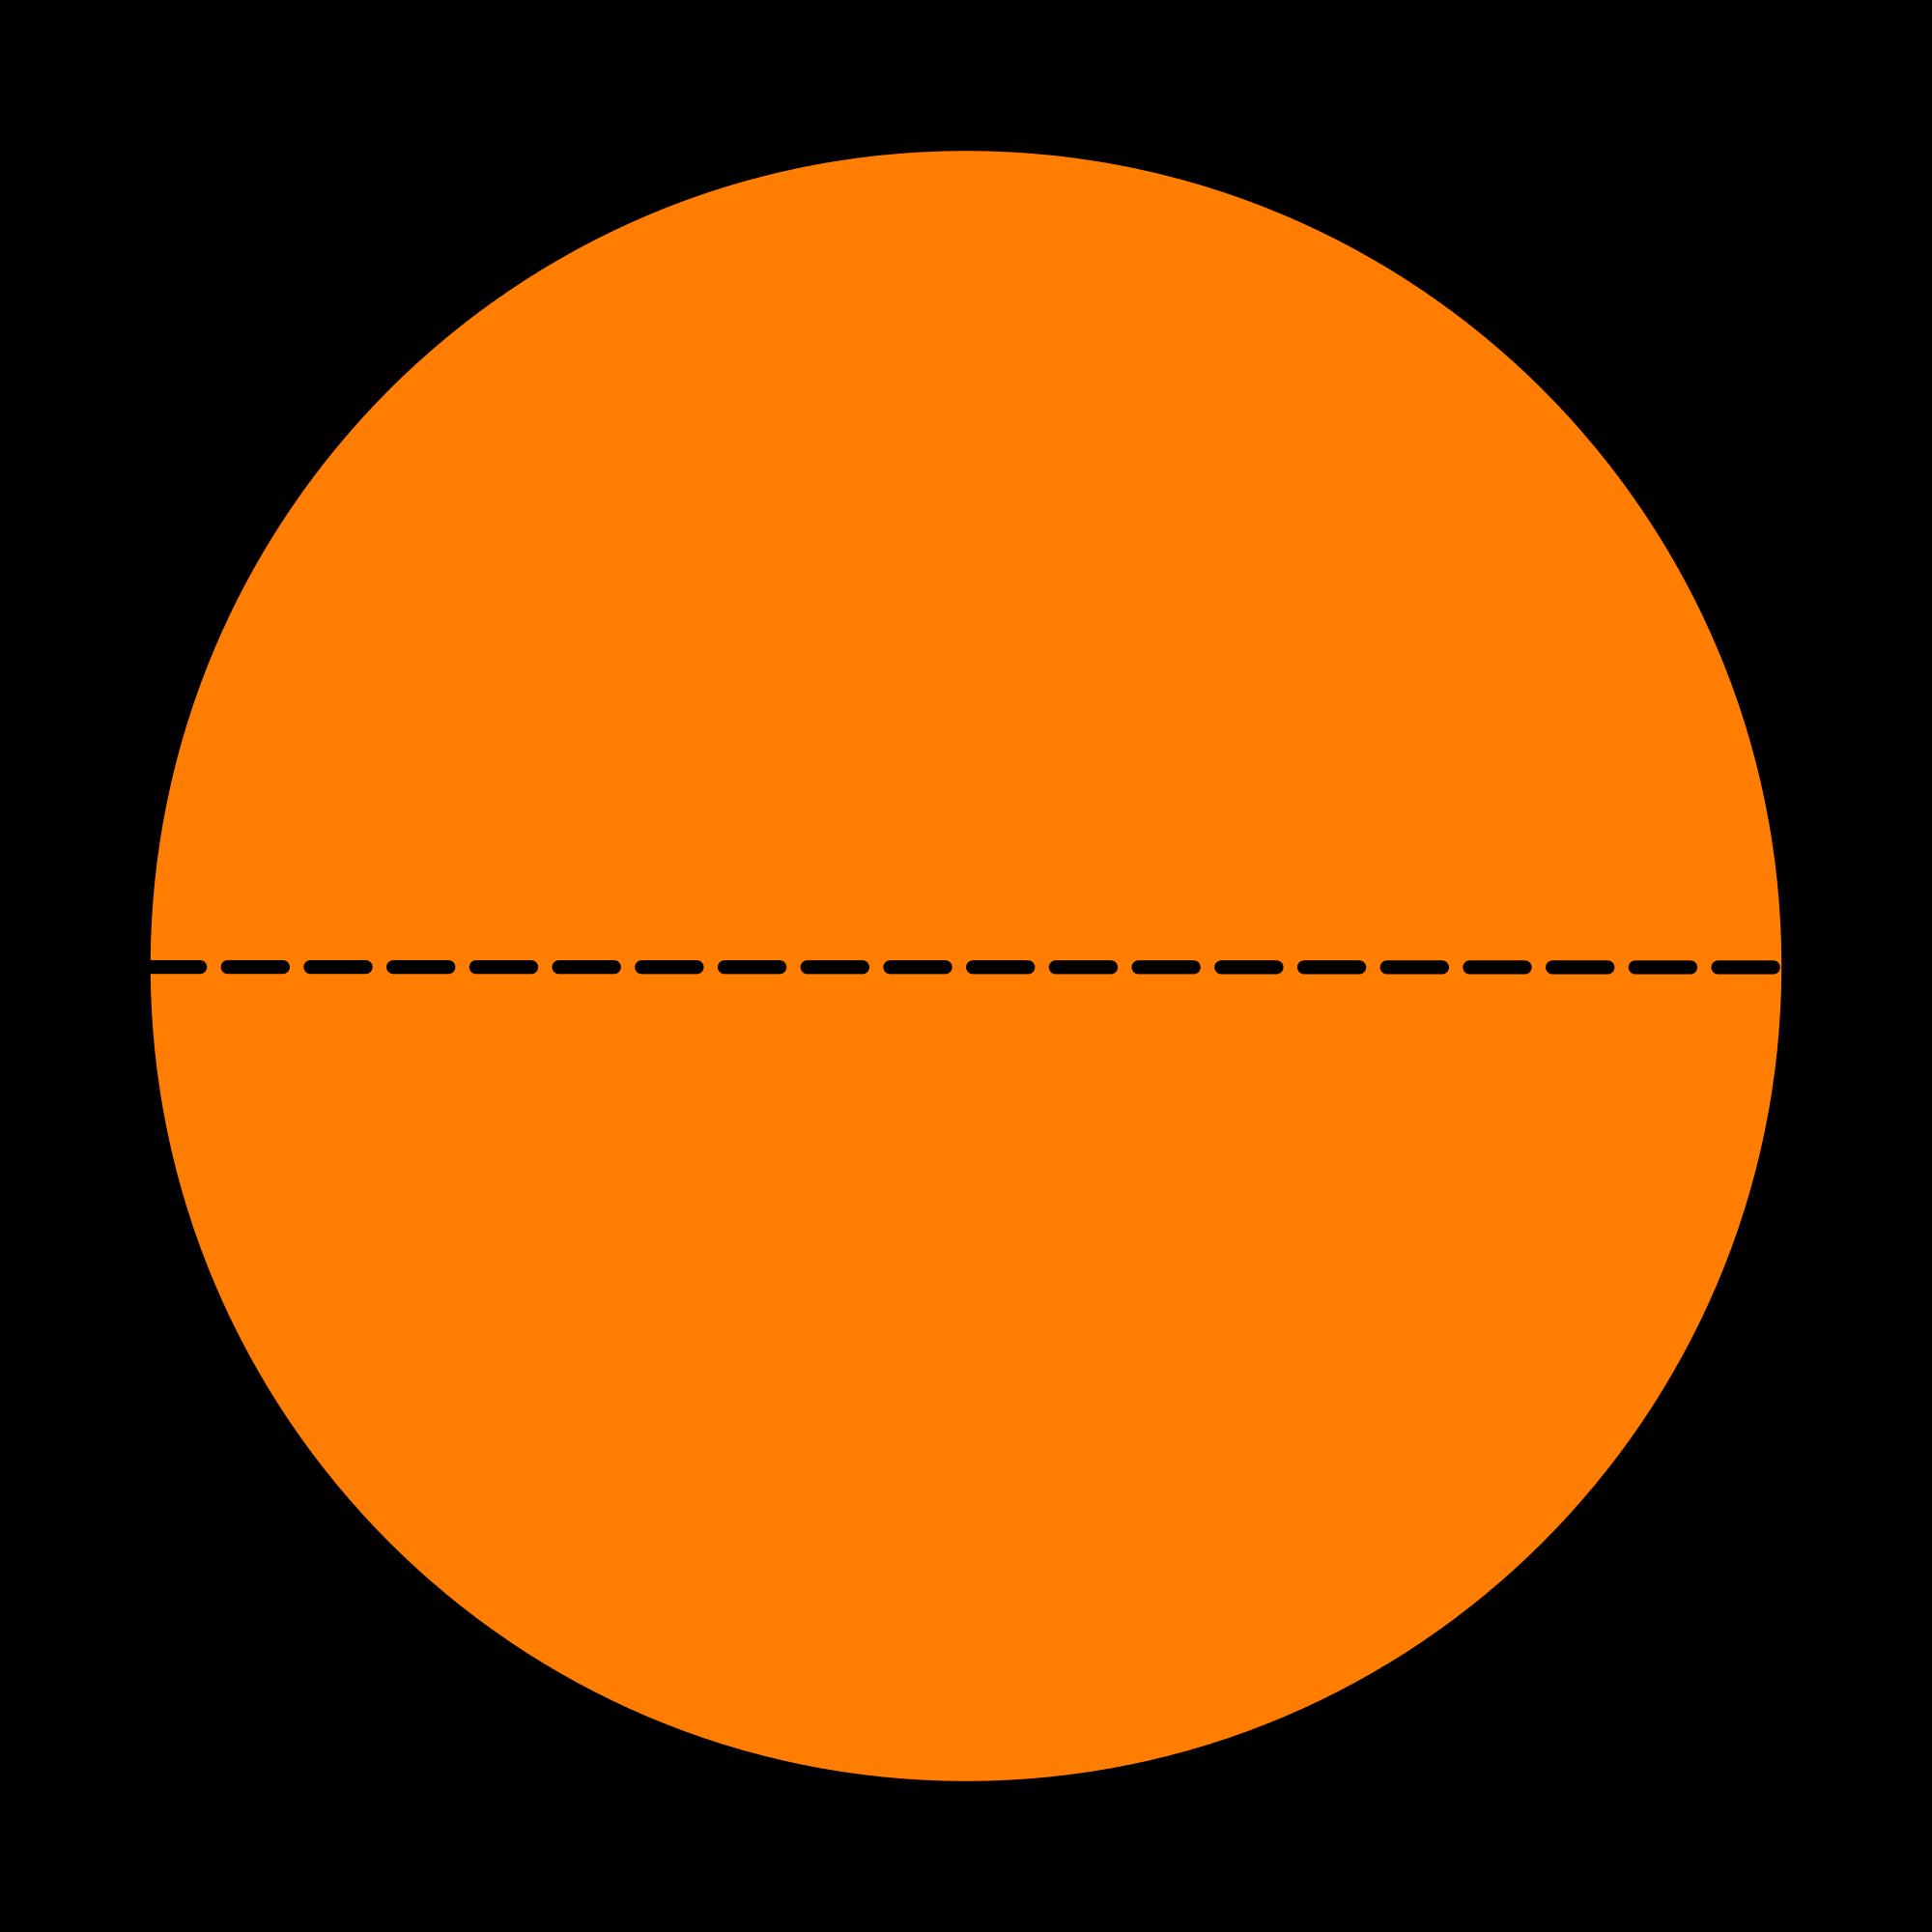 Fractions clipart half. File piechartfractionhalves svg wikimedia